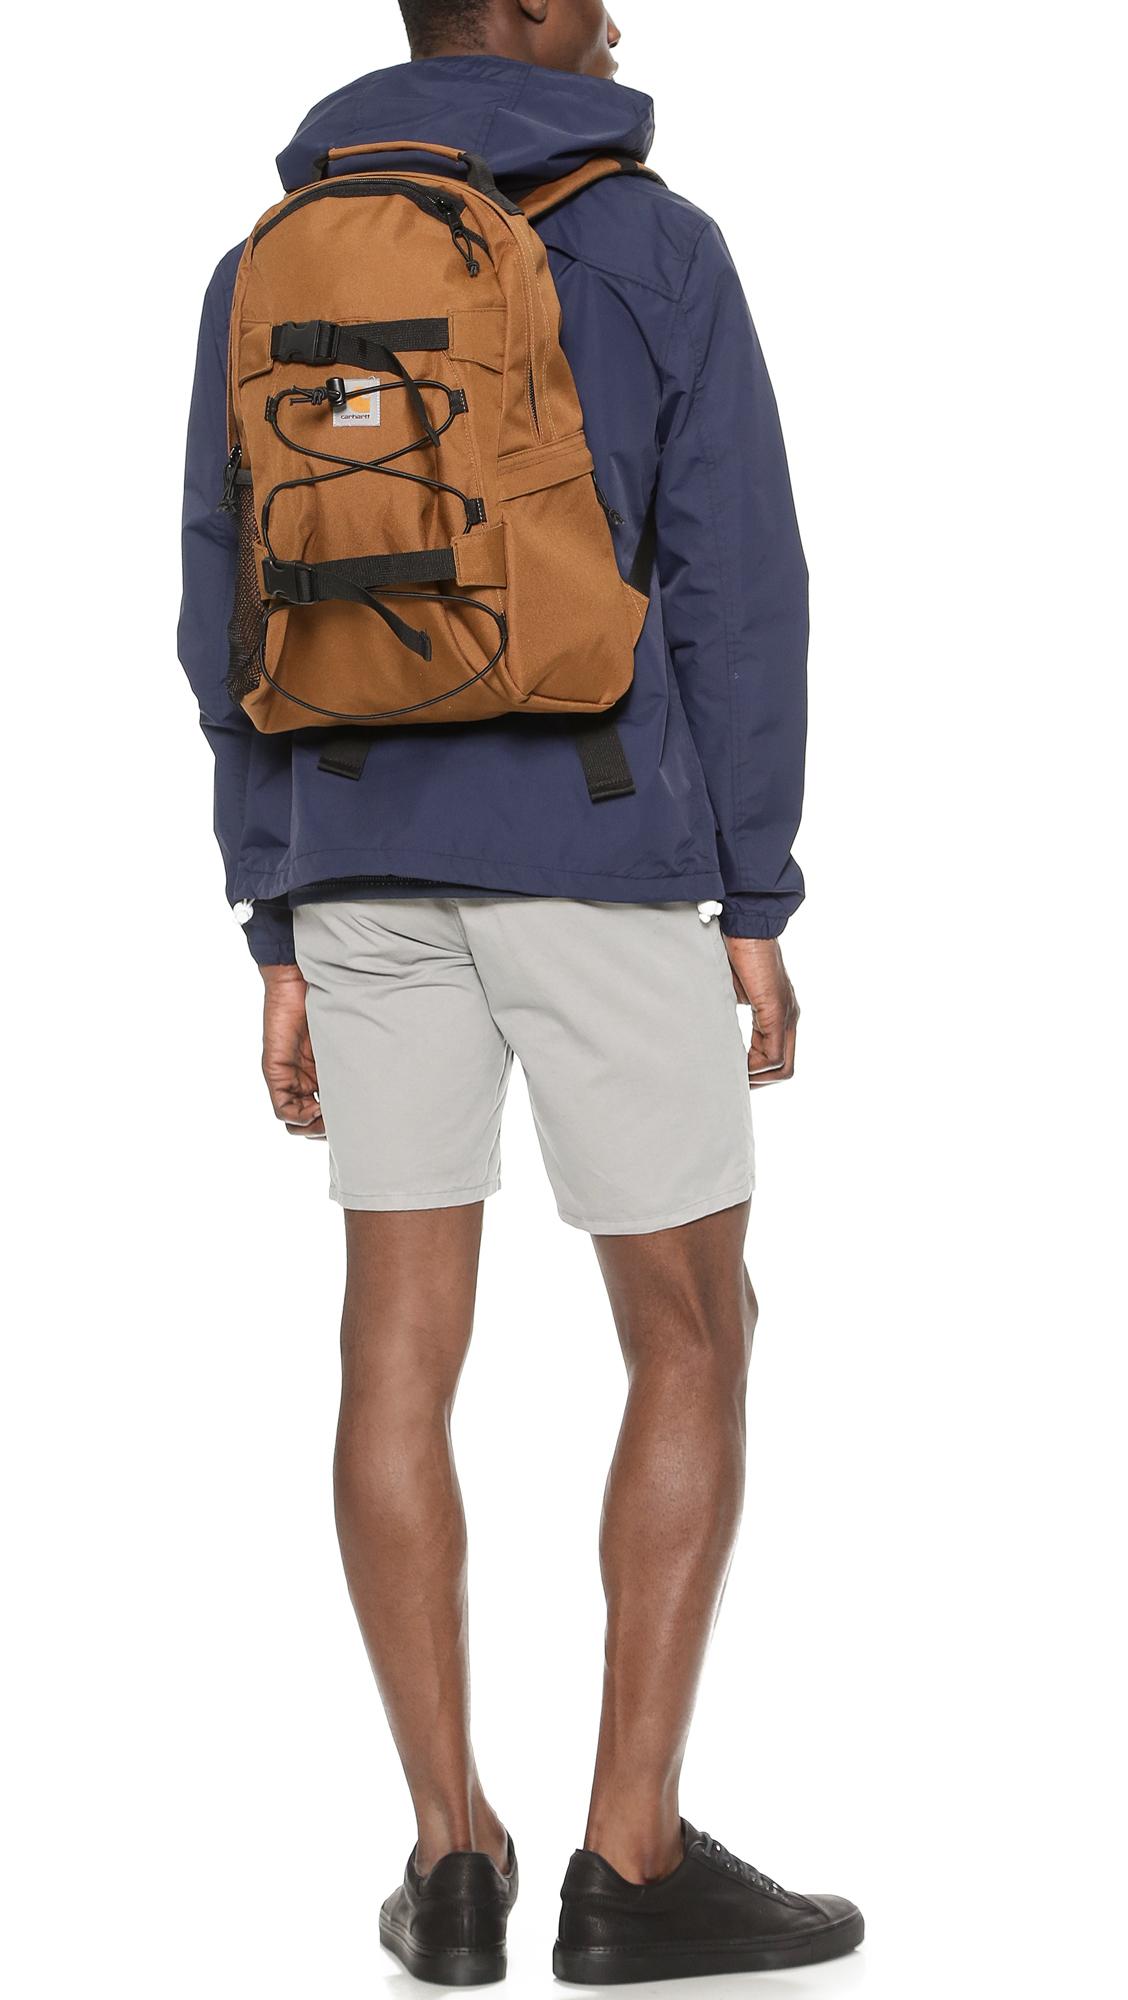 Lyst Carhartt Wip Kickflip Backpack In Brown For Men